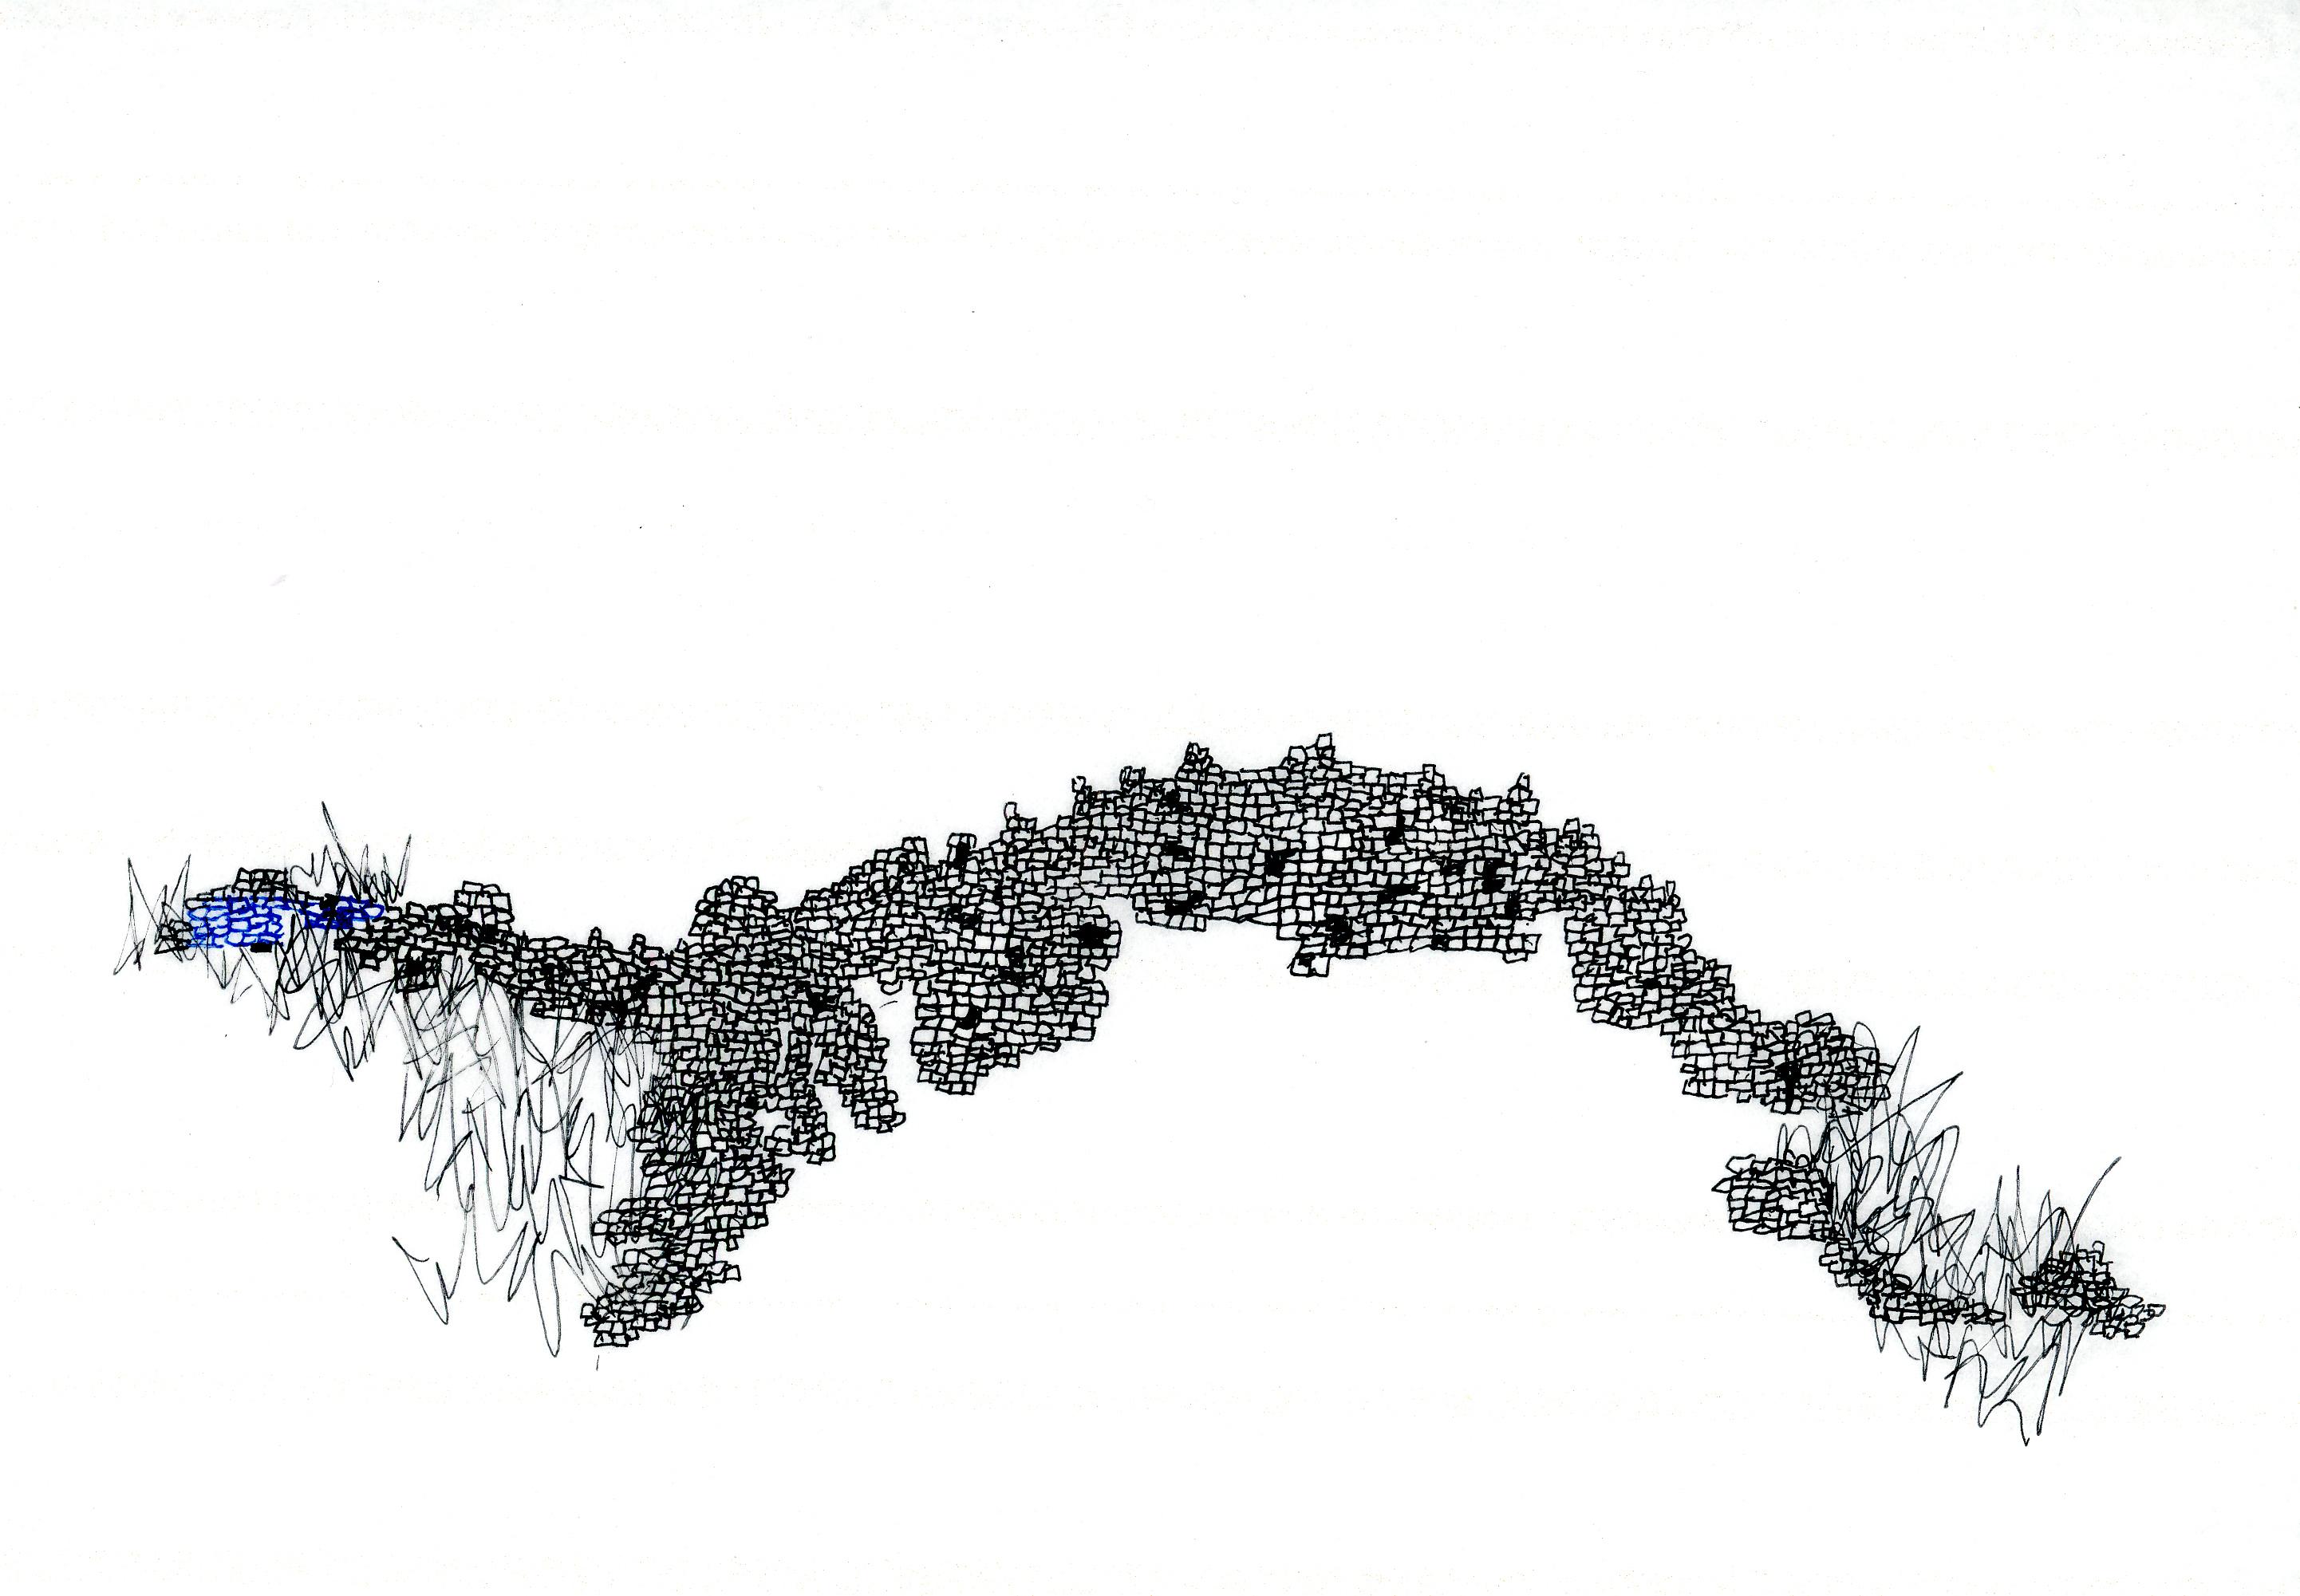 For You Too (Bridge)